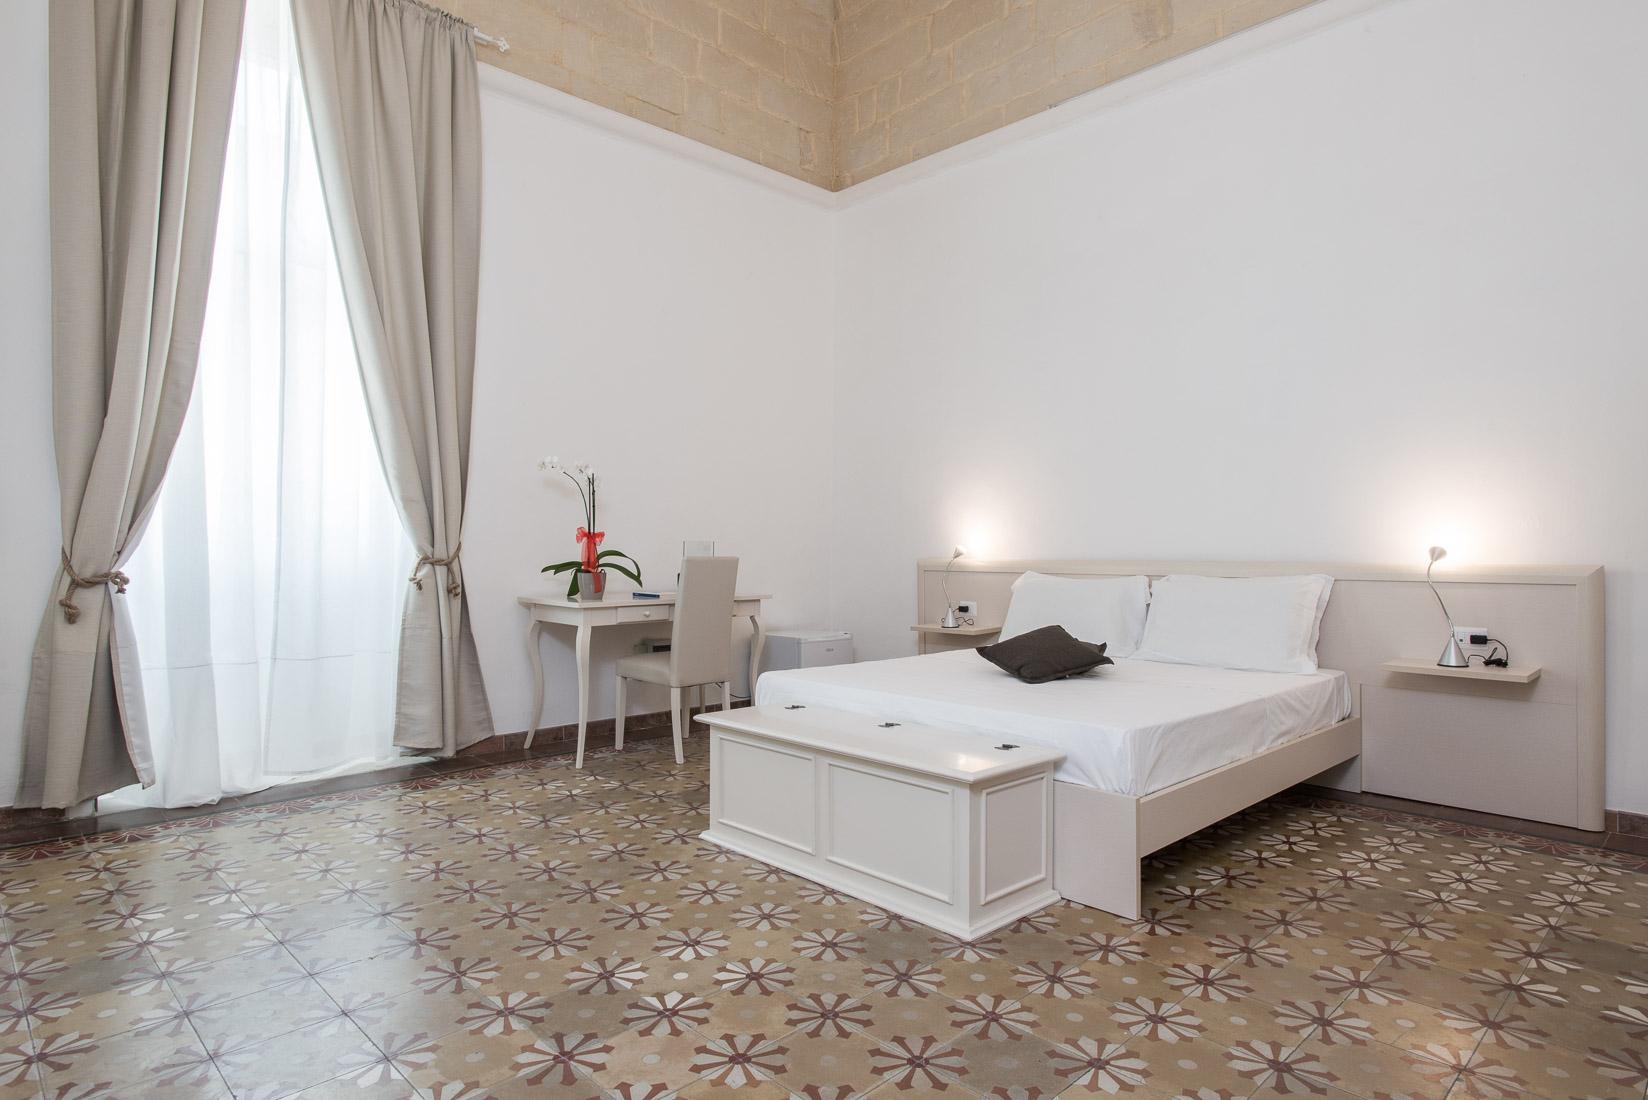 https://www.orlandinifrancesco.com/wp/wp-content/uploads/2019/01/Ada-Suite-Lecce-9.jpg